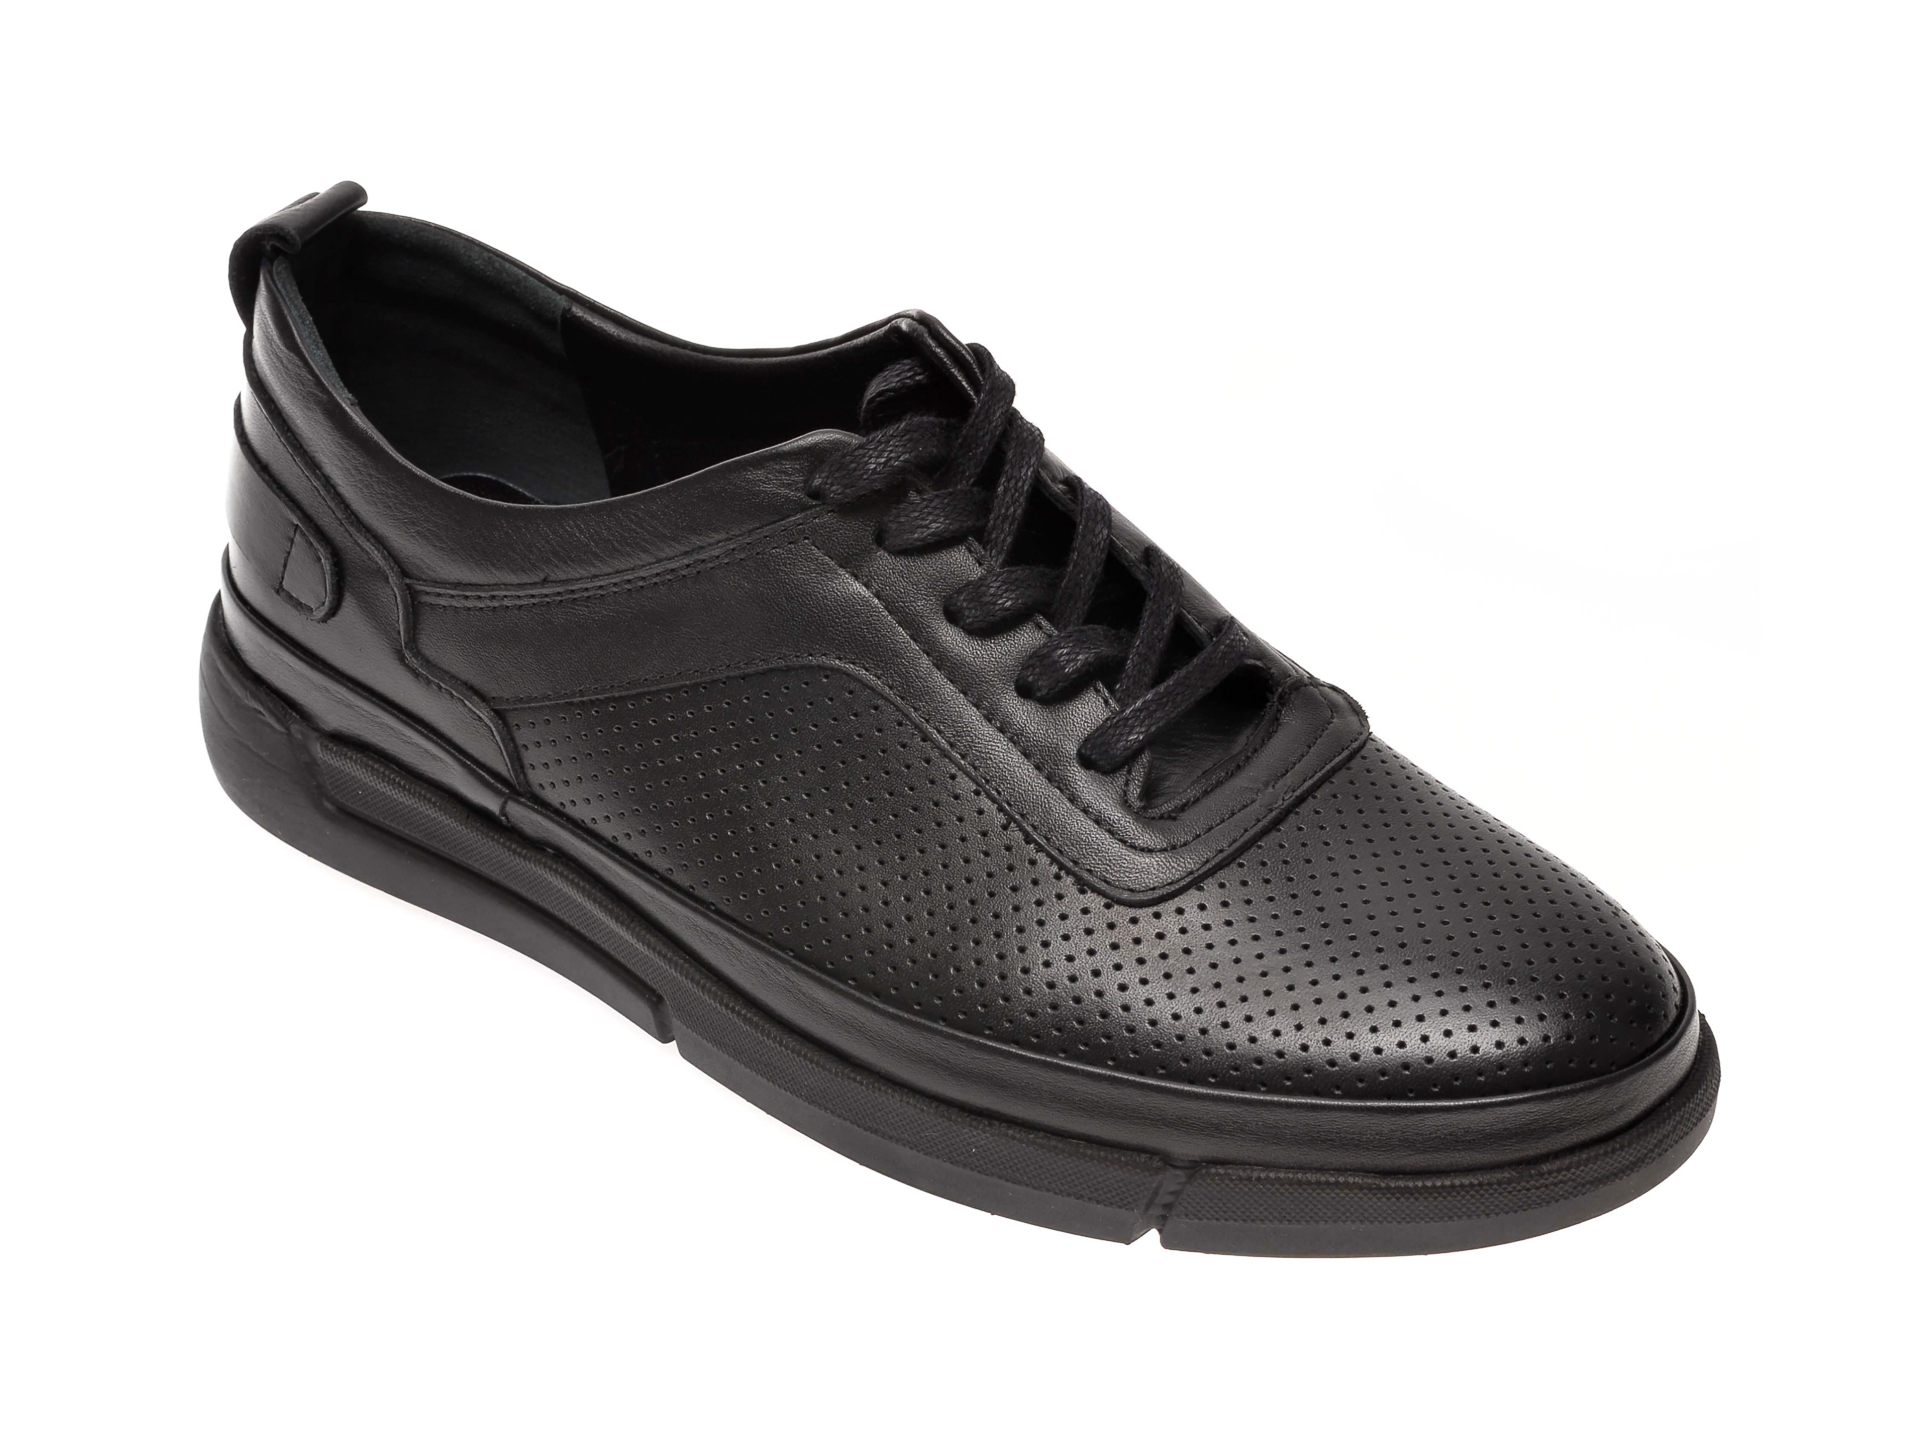 Pantofi OTTER negri, 402, din piele naturala imagine